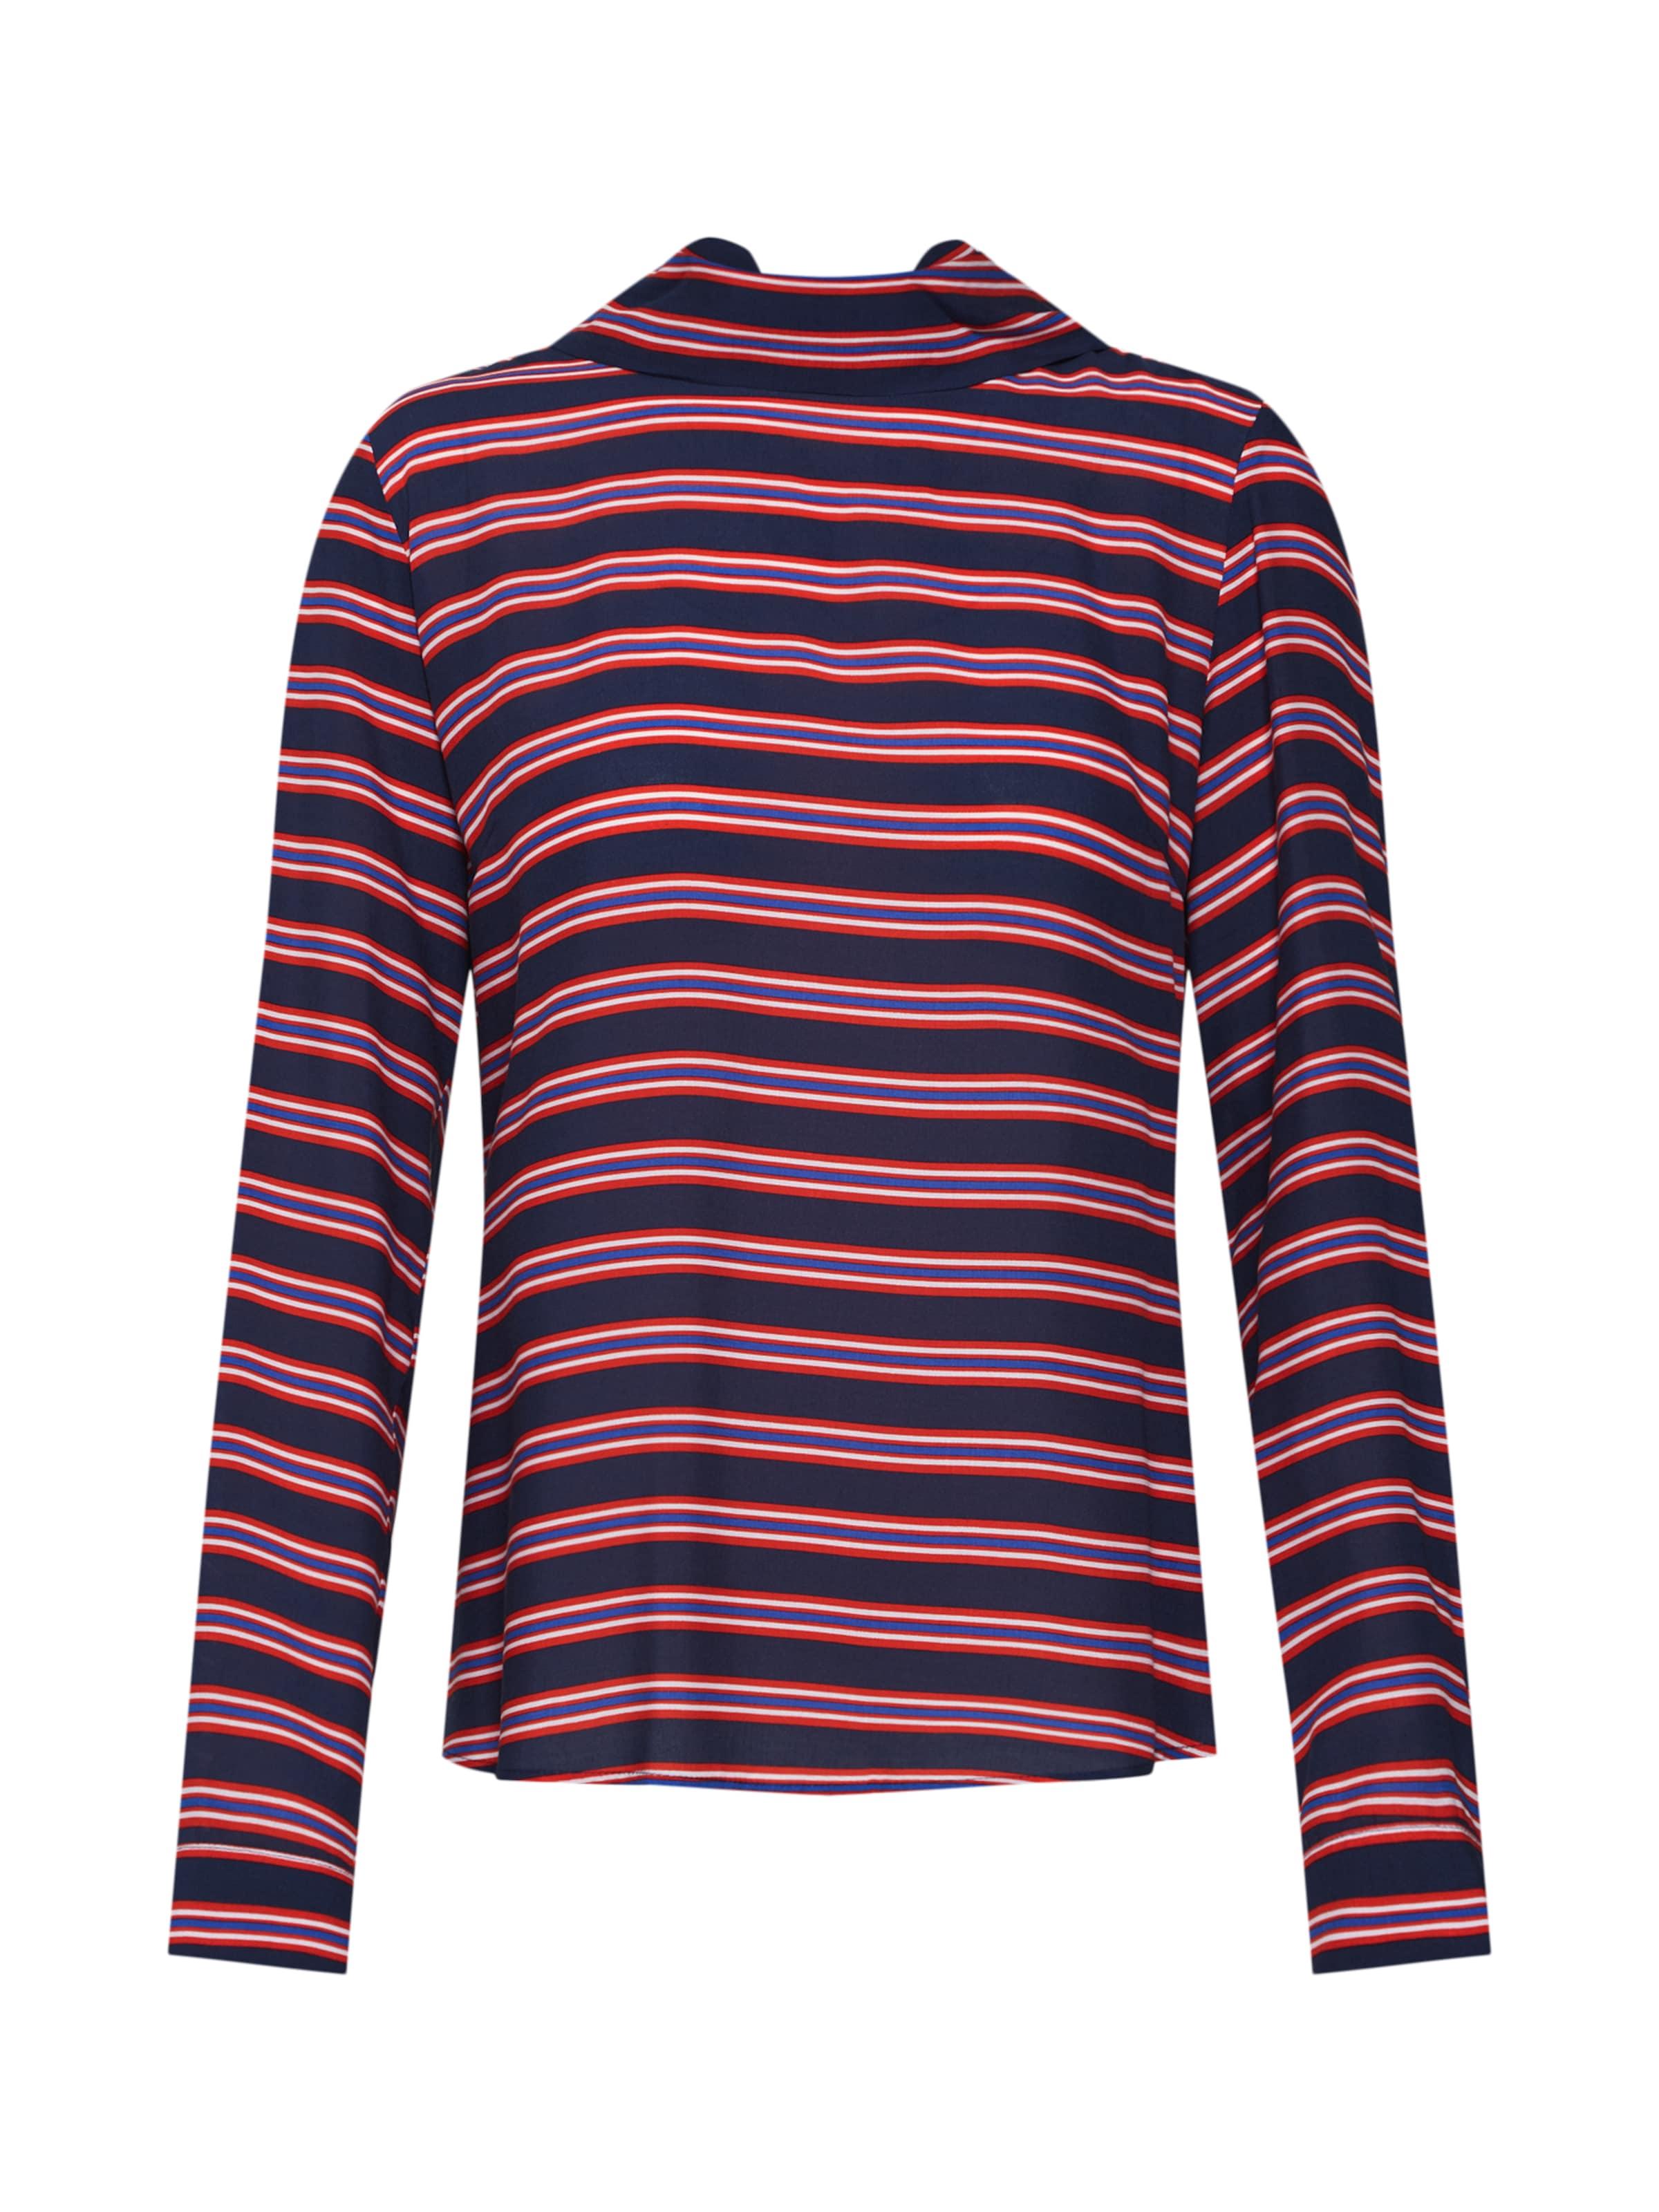 Bluse Van Den In Emily Bergh BlauRot 6yf7gvbY